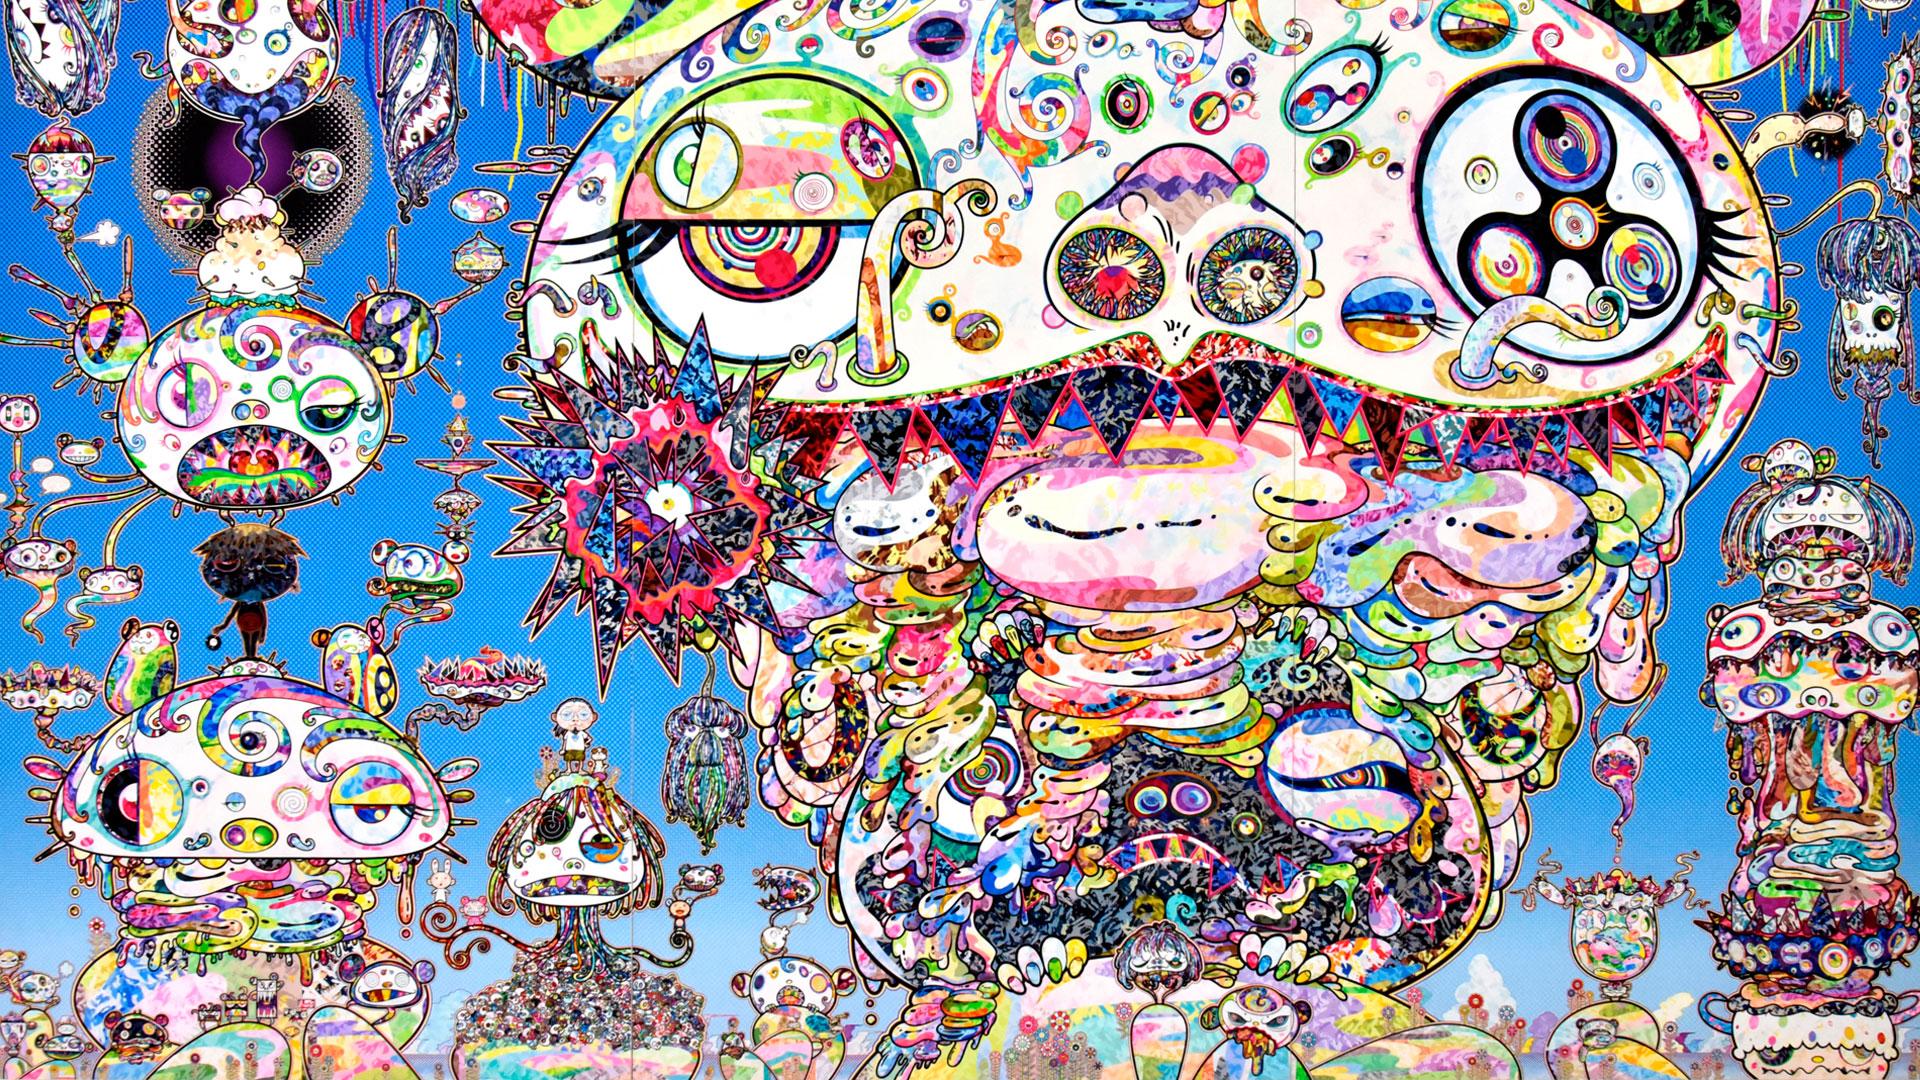 Imagen de artista japonés